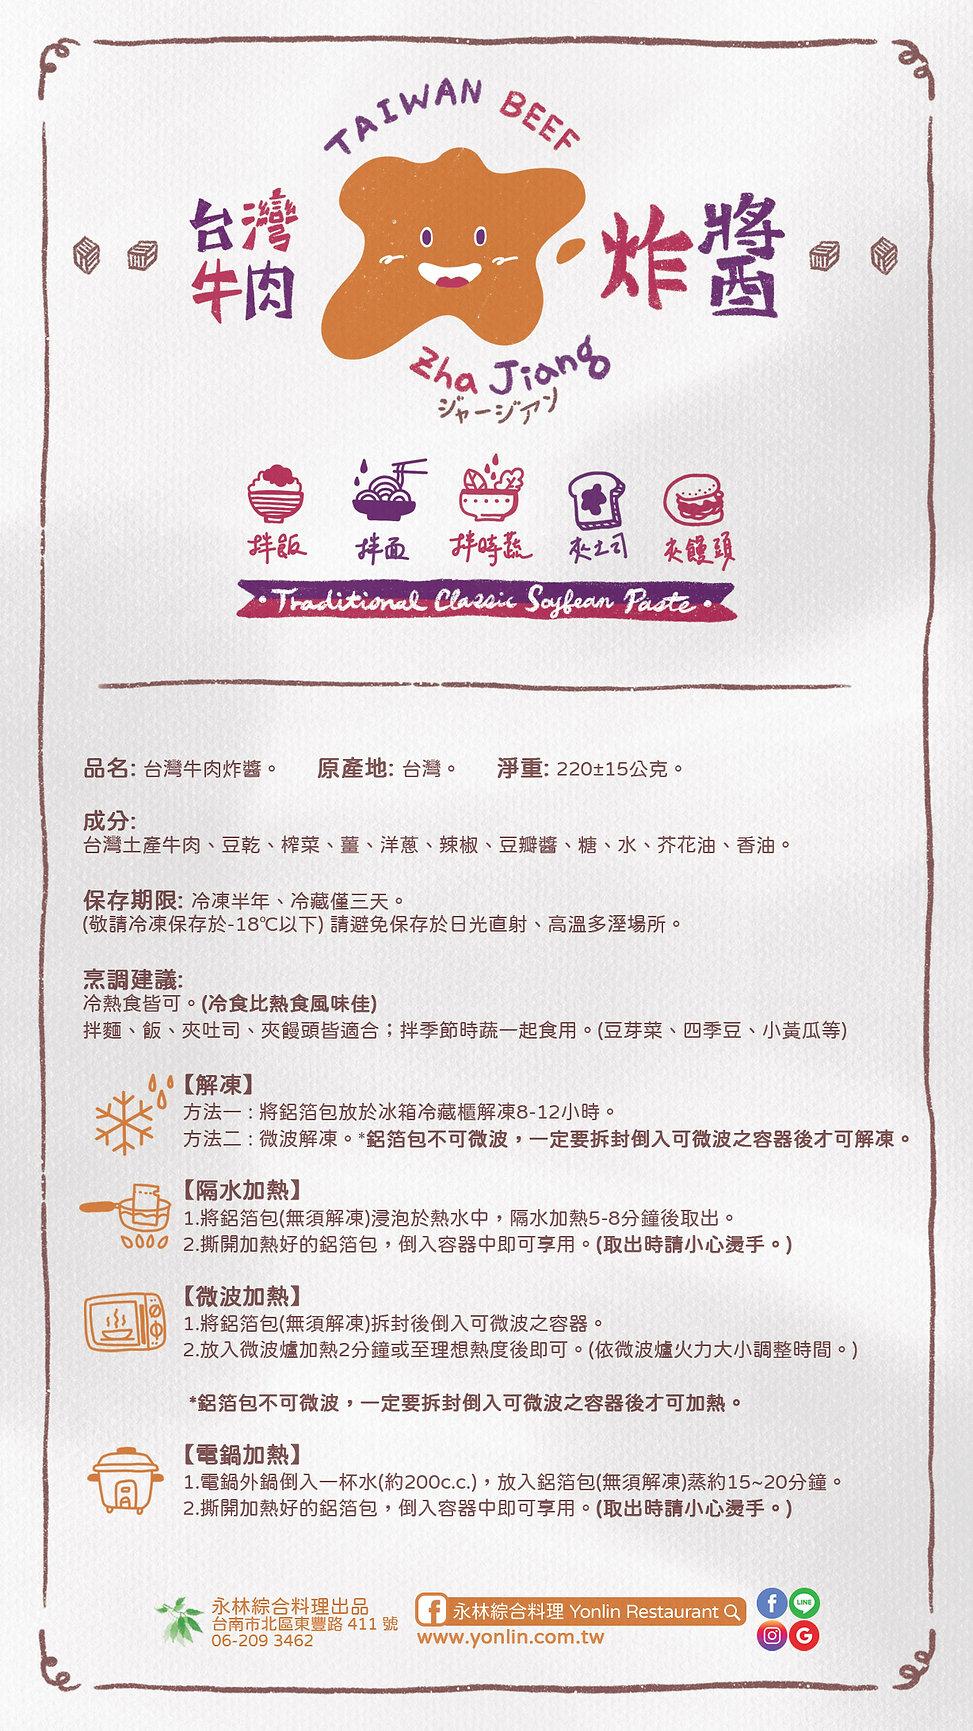 10x10cm-台灣牛肉炸醬貼紙-詳細說明.jpg